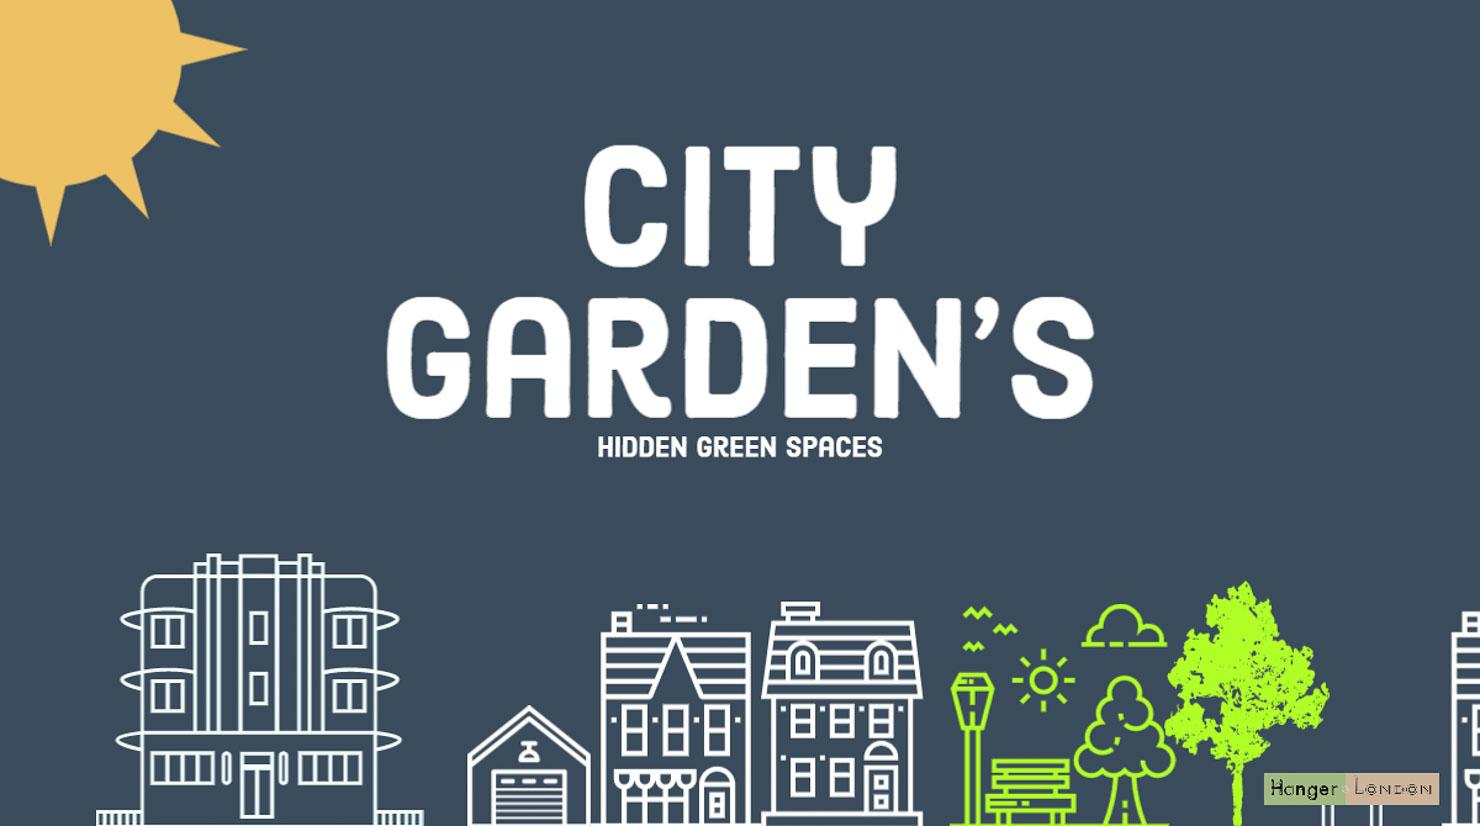 City Gardens of London